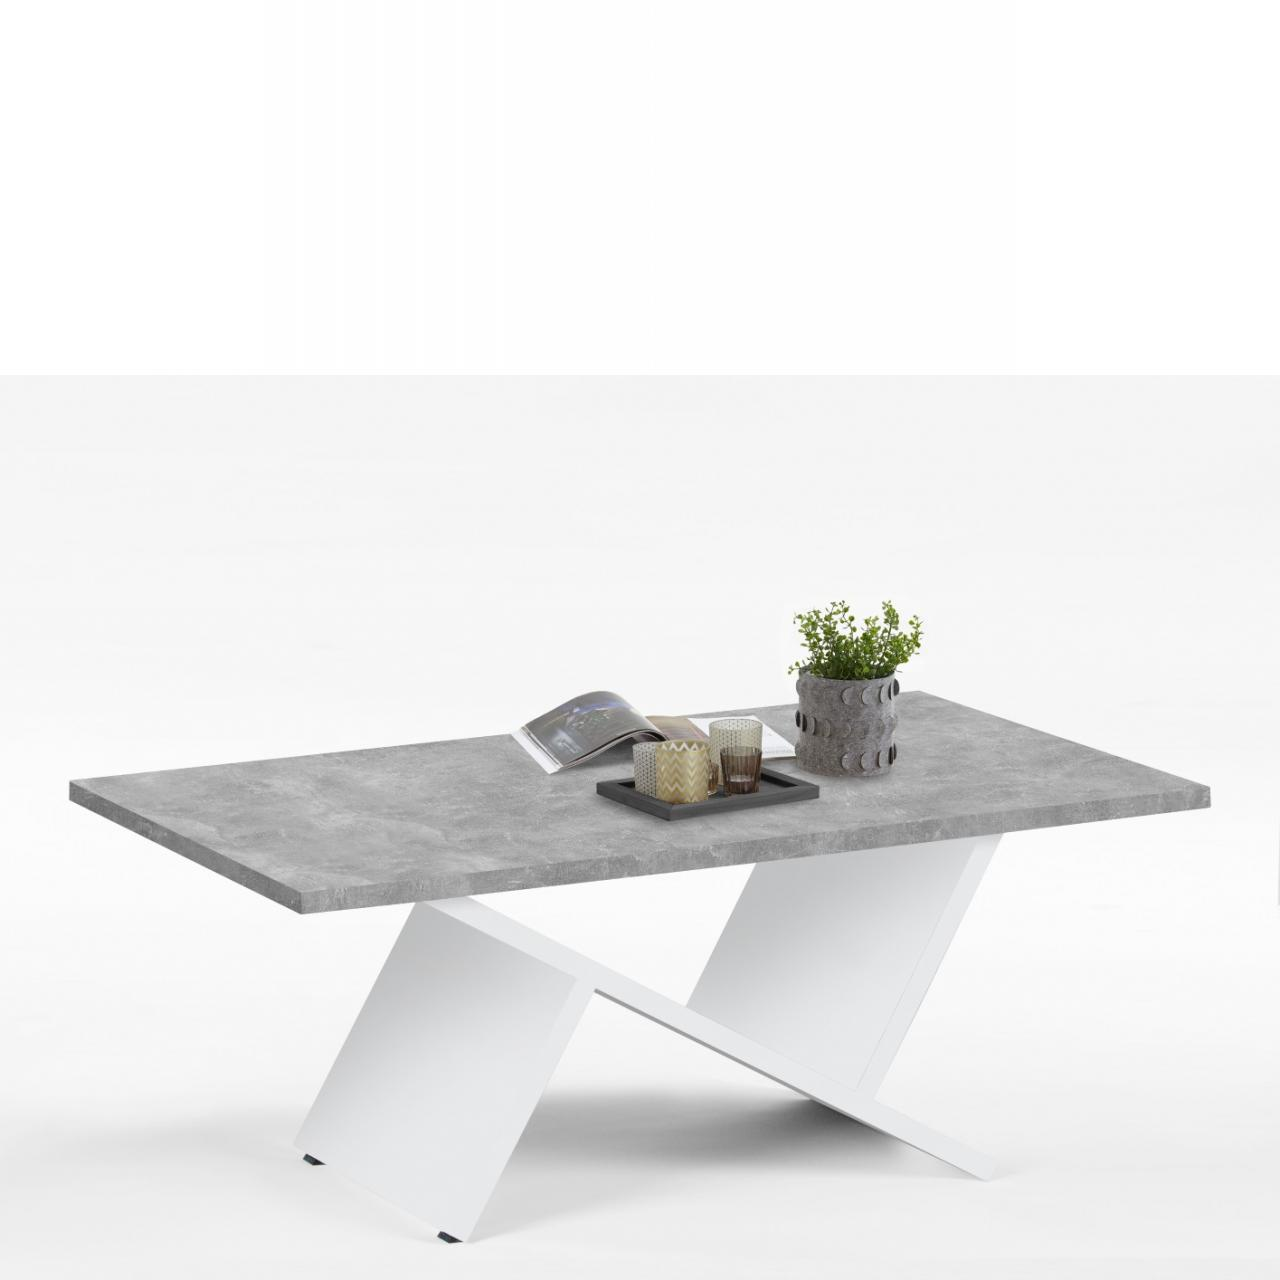 Couchtisch - Kall - weiss/beton